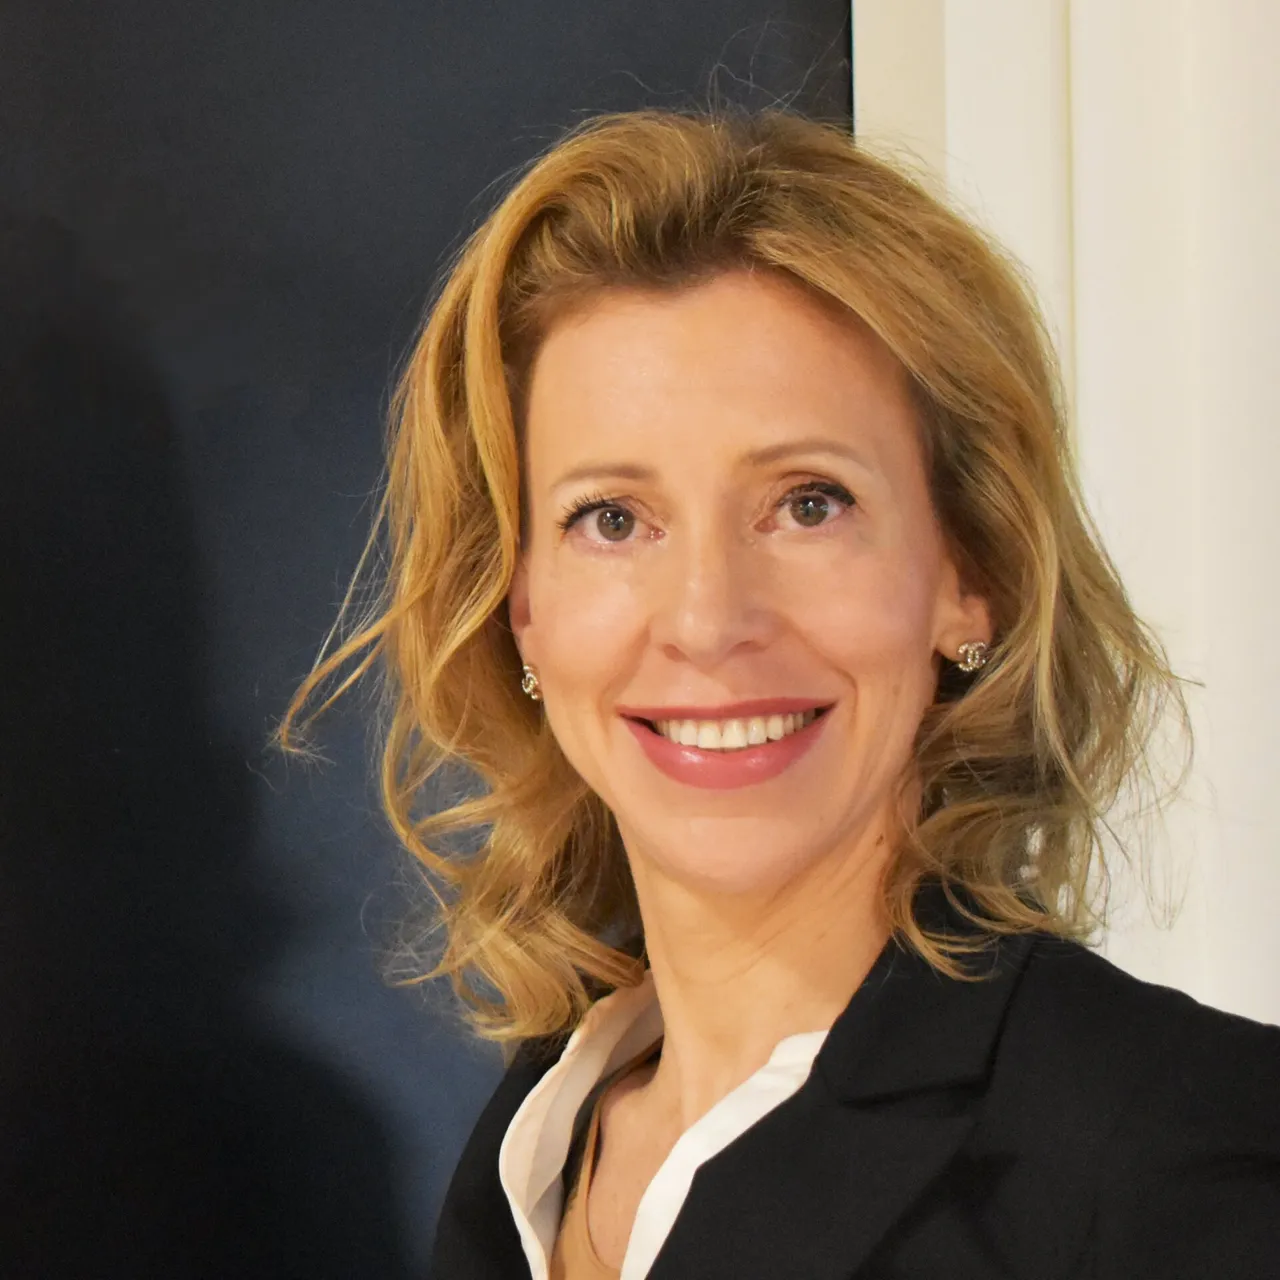 Cornelia Schaurecker